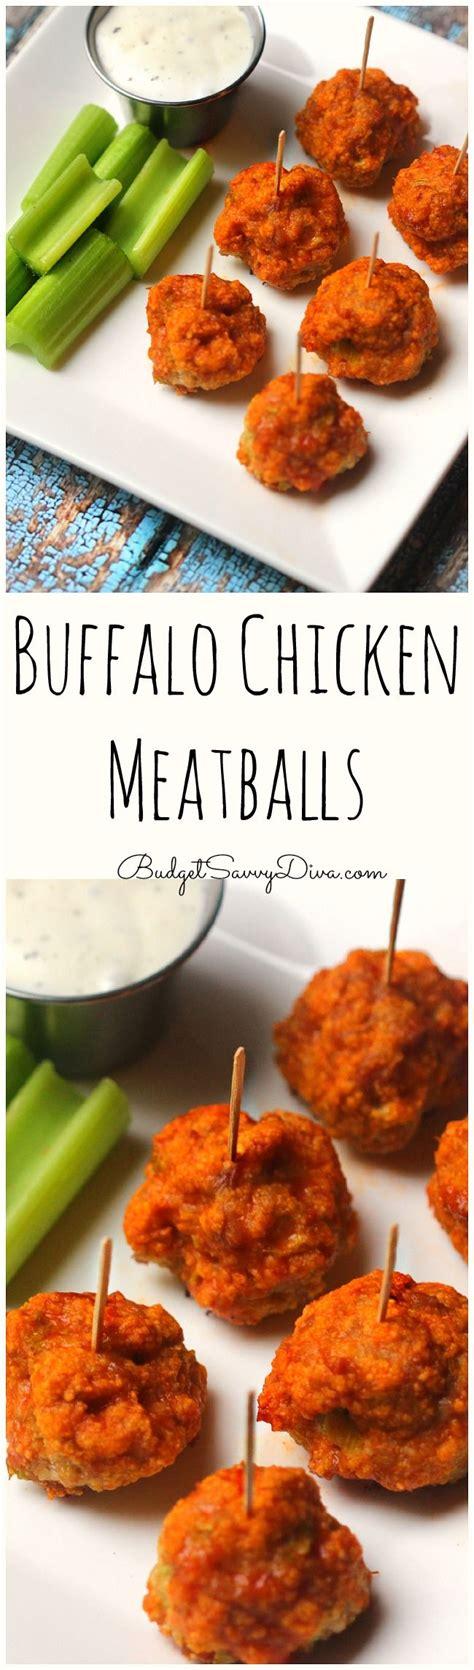 buffalo chicken meatballs recipe food chicken meatball recipes appetizer recipes ground